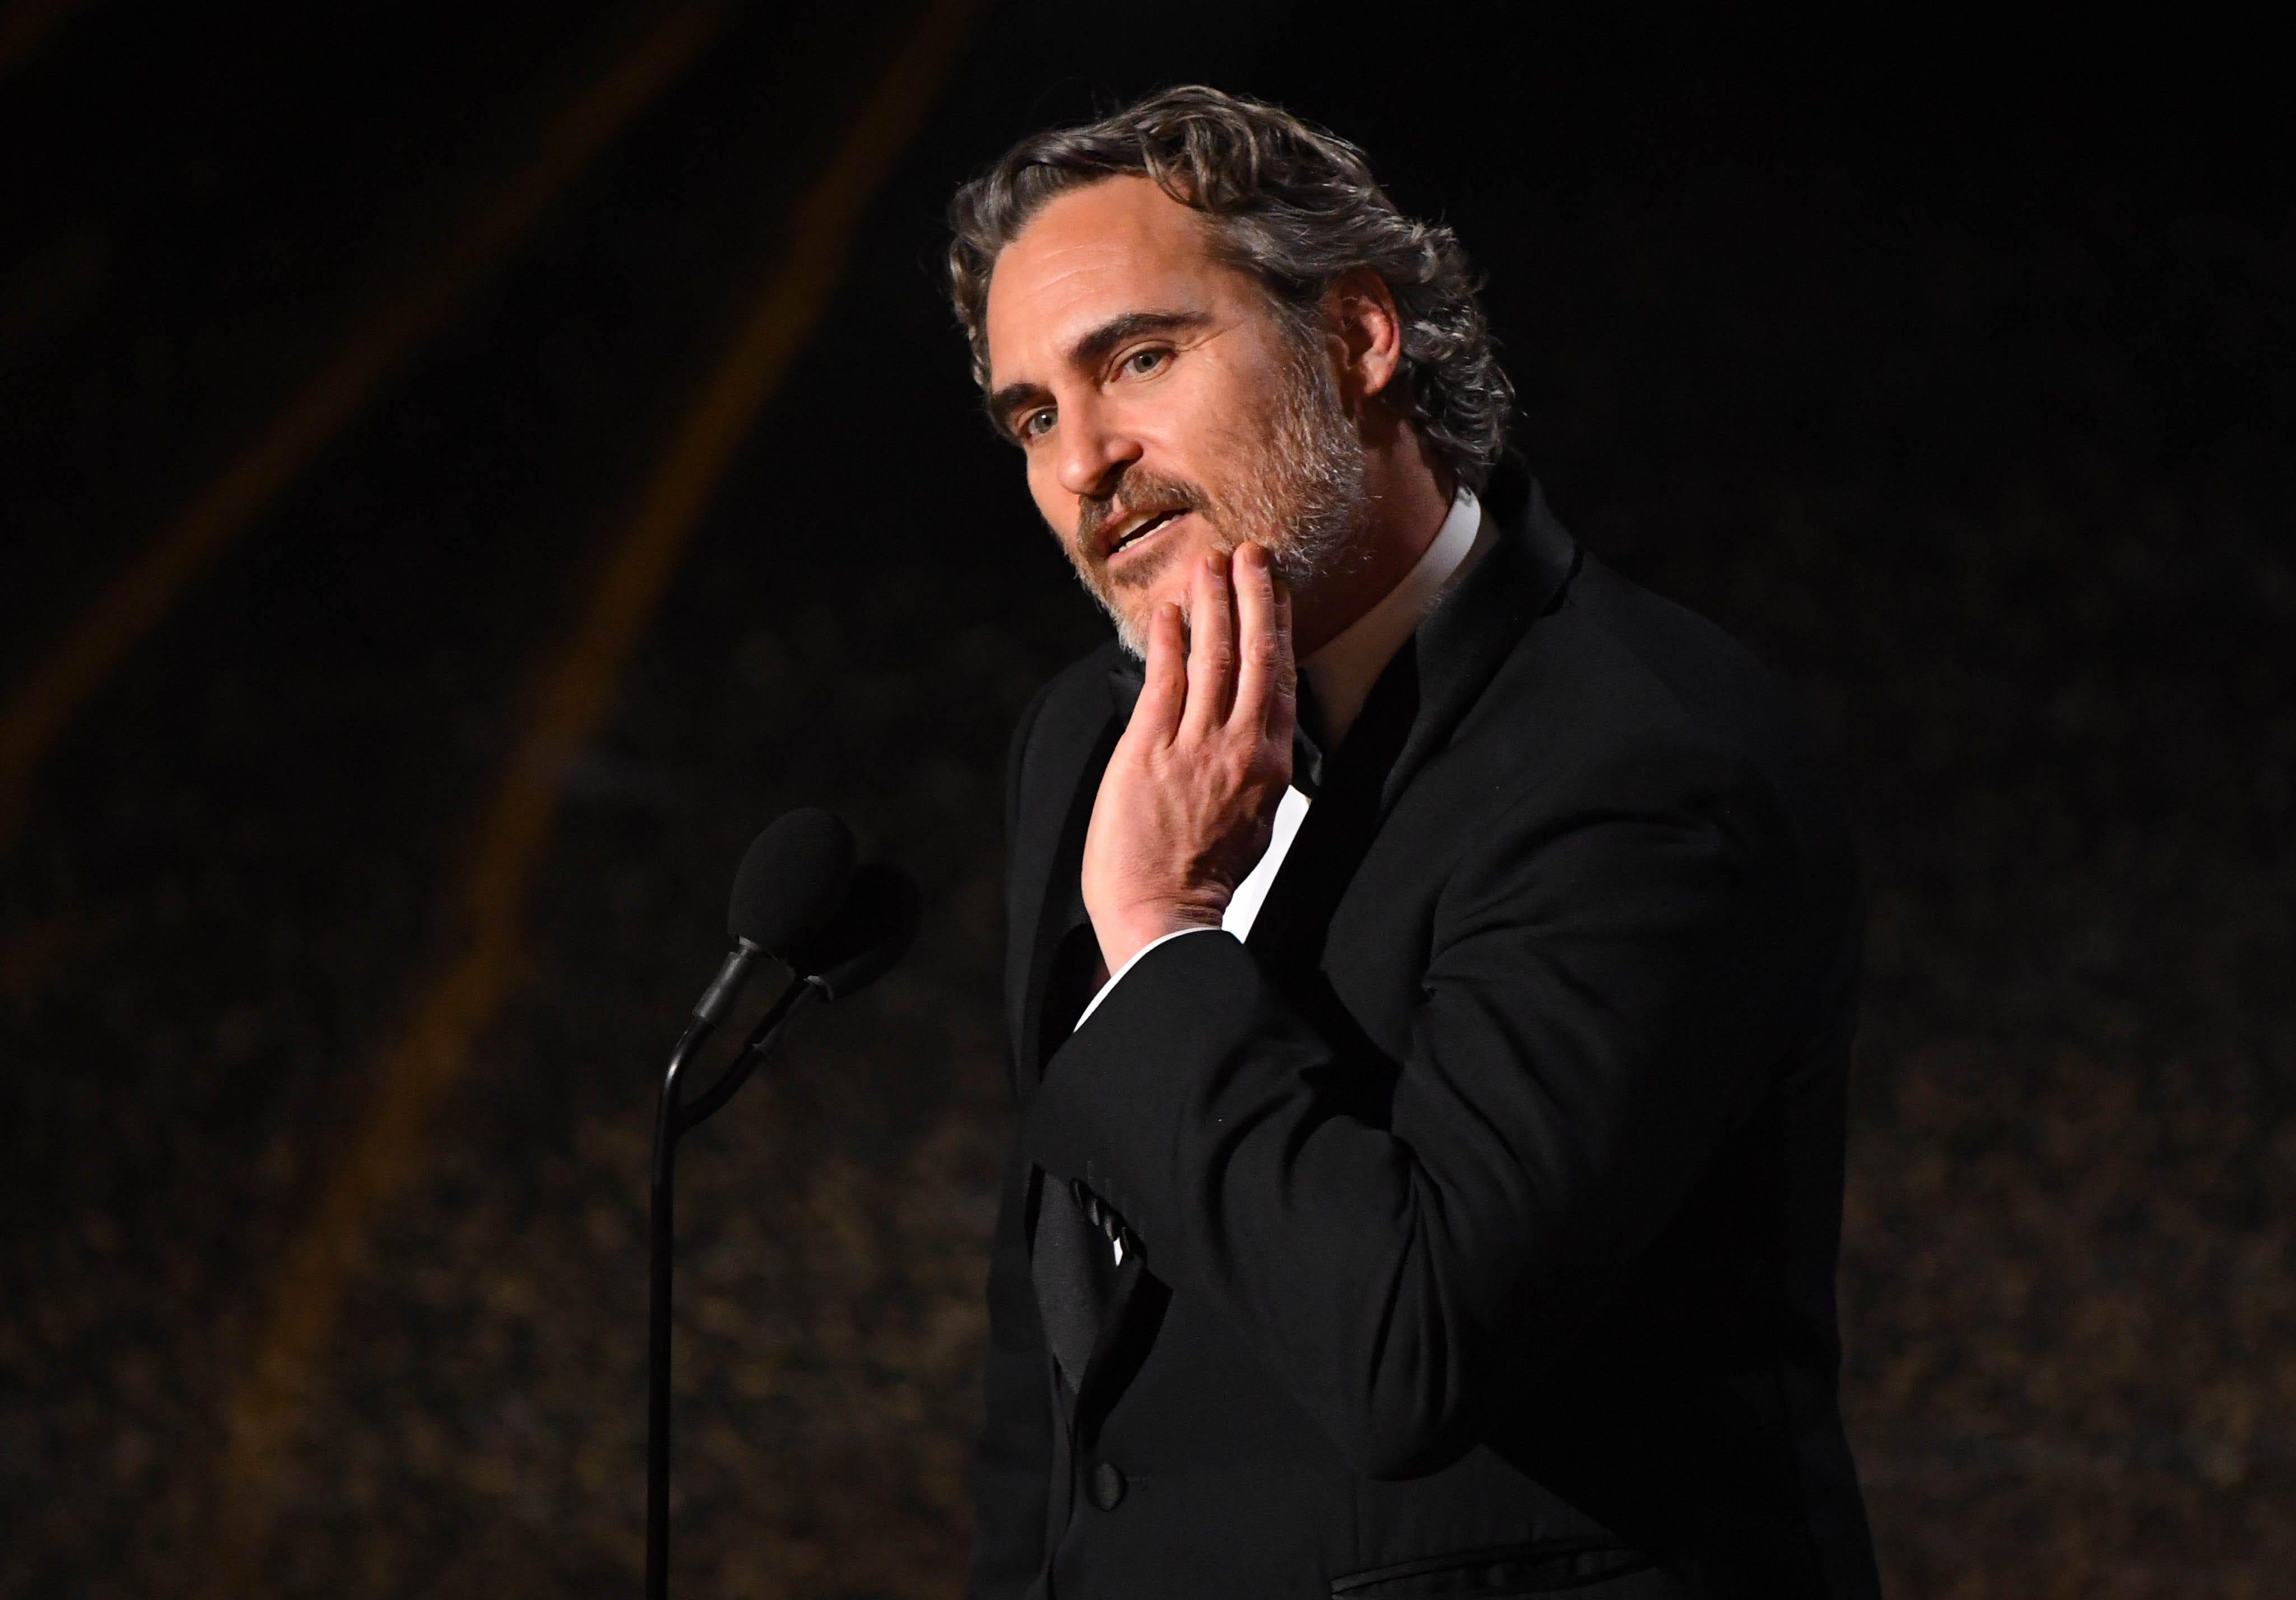 Oscars 2020: Farmers respond to Joaquin Phoenix s anti-dairy best-actor acceptance speech